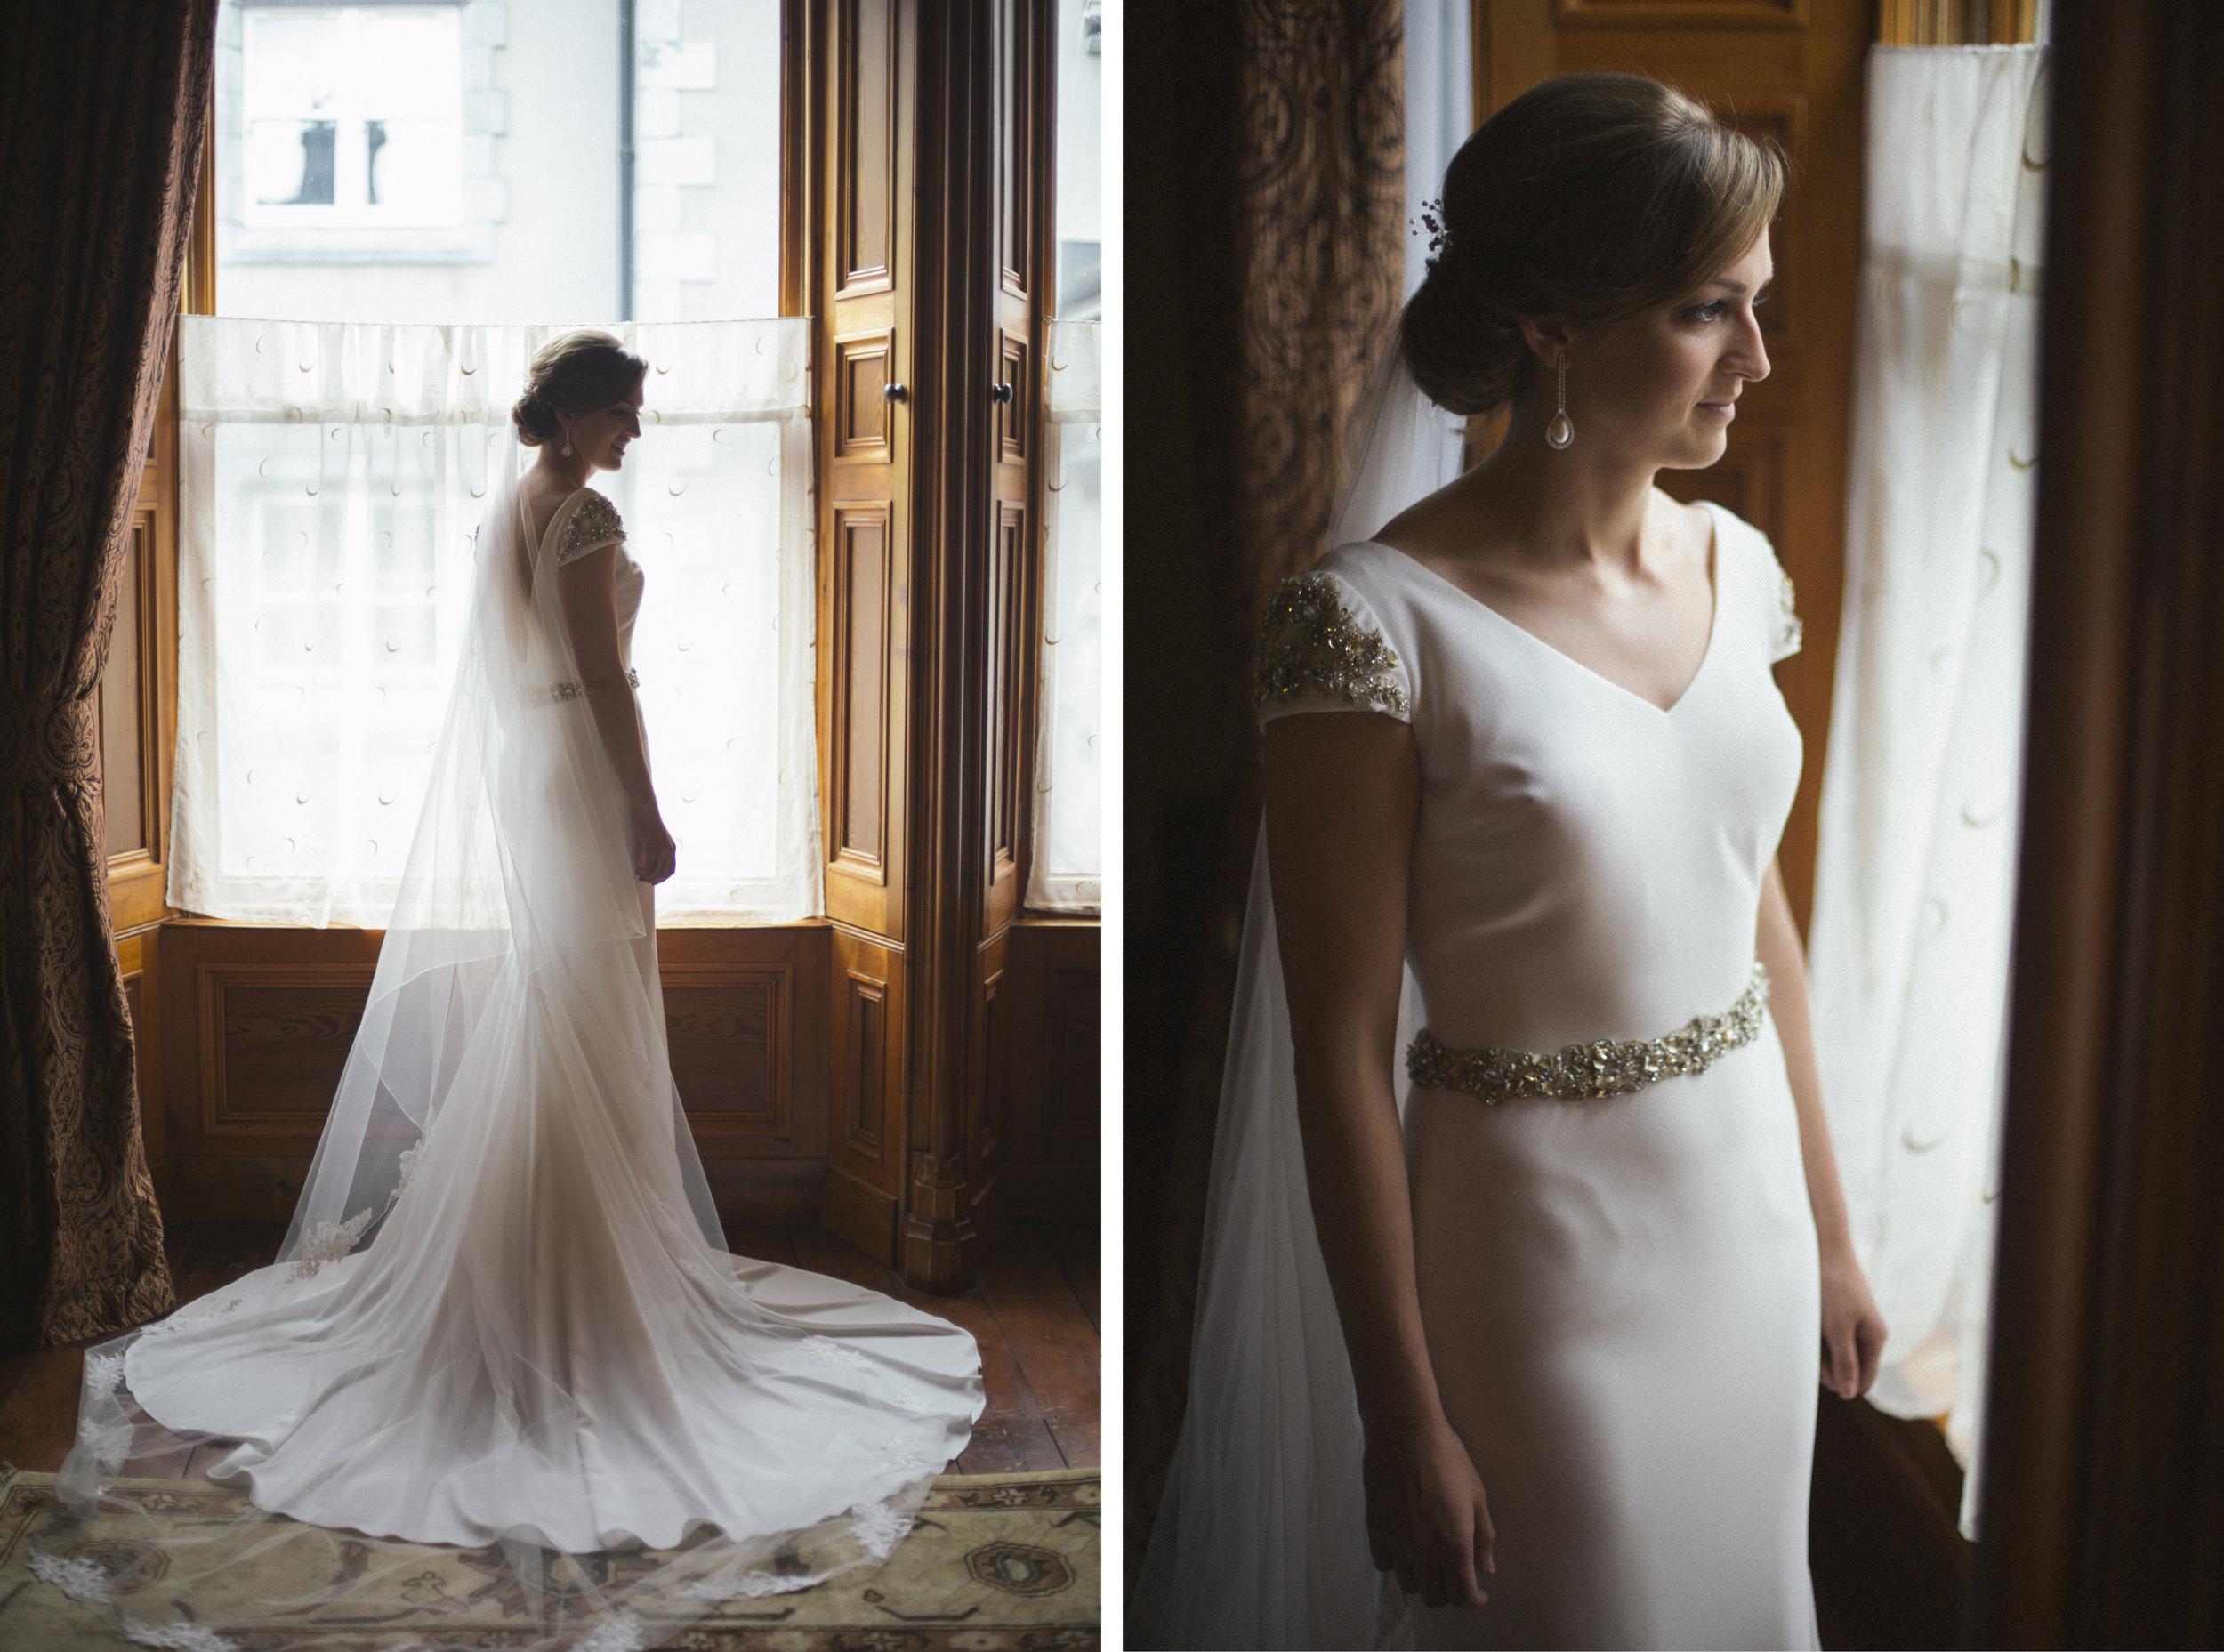 Helena Charlotte Wedding Photography-6.jpg